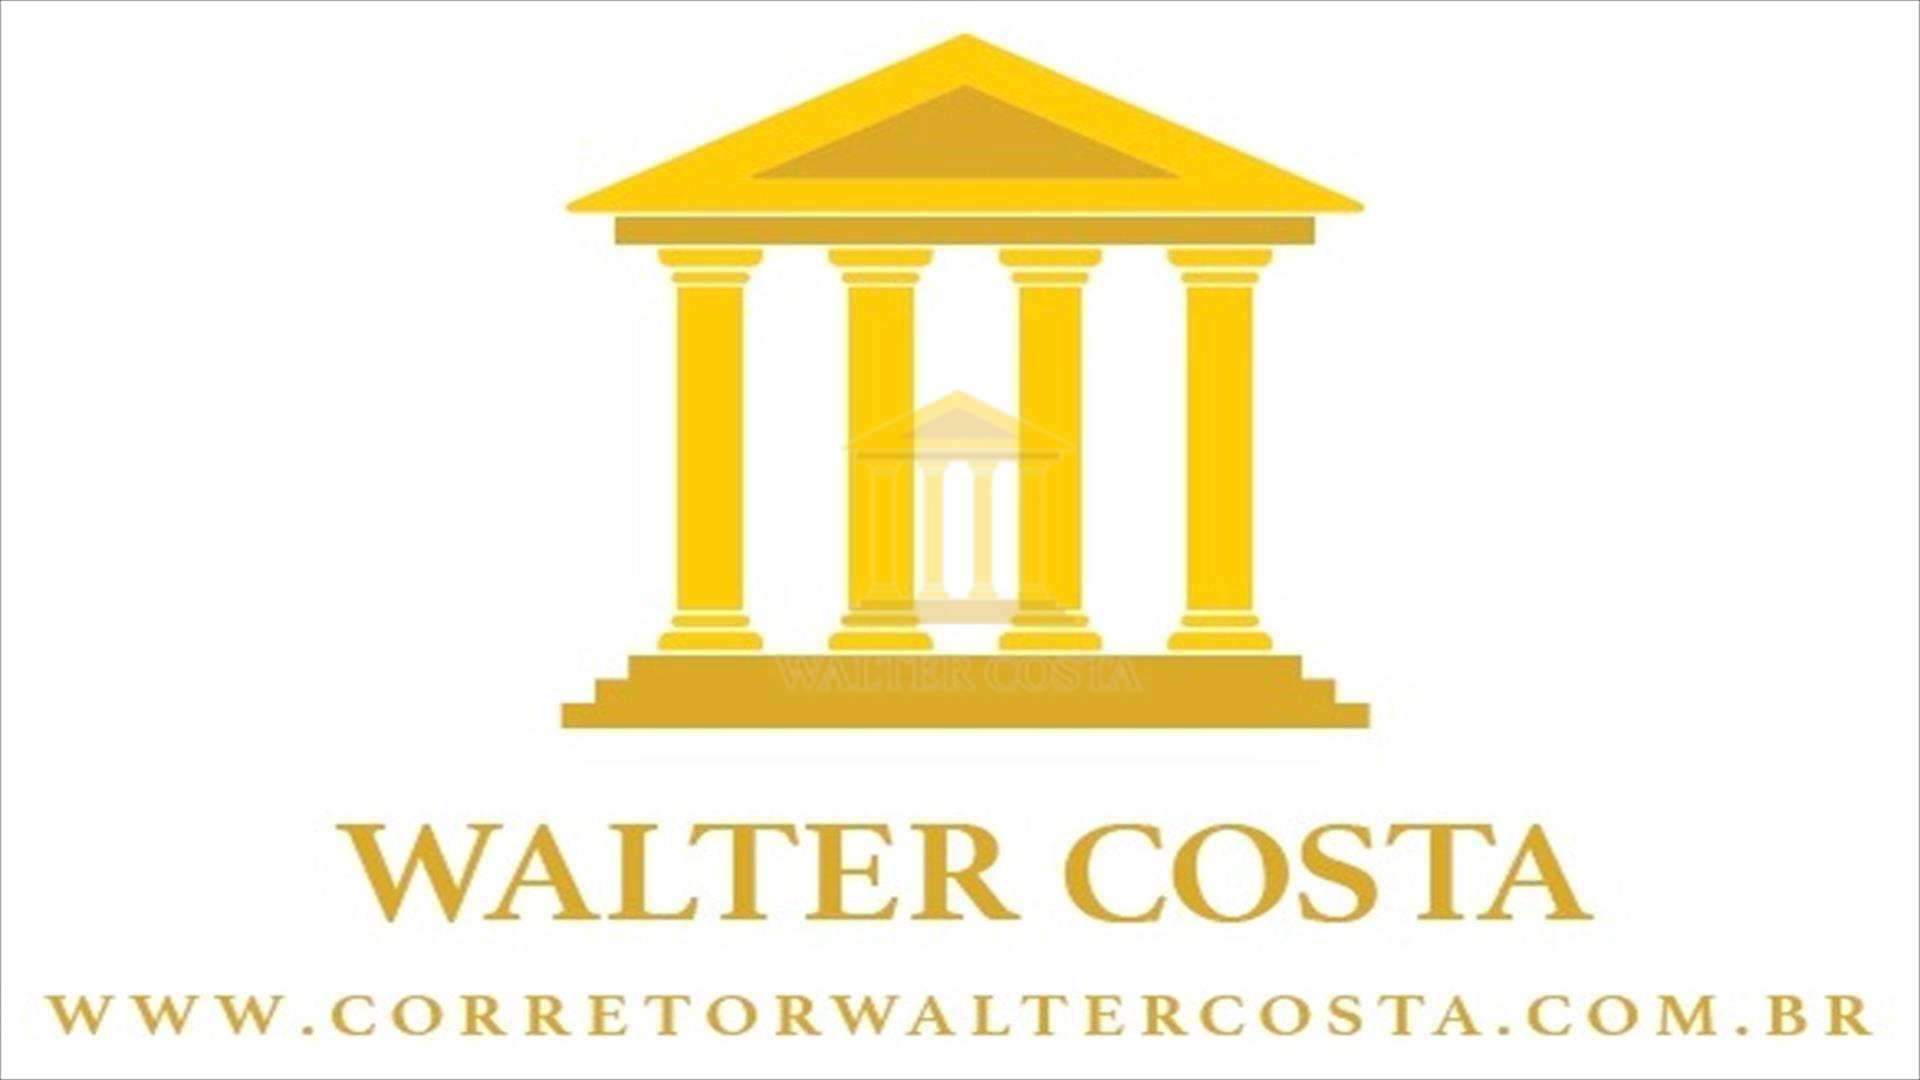 10900-LOGO_CORRETOR_WALTER_COSTA_NOVO.jpg